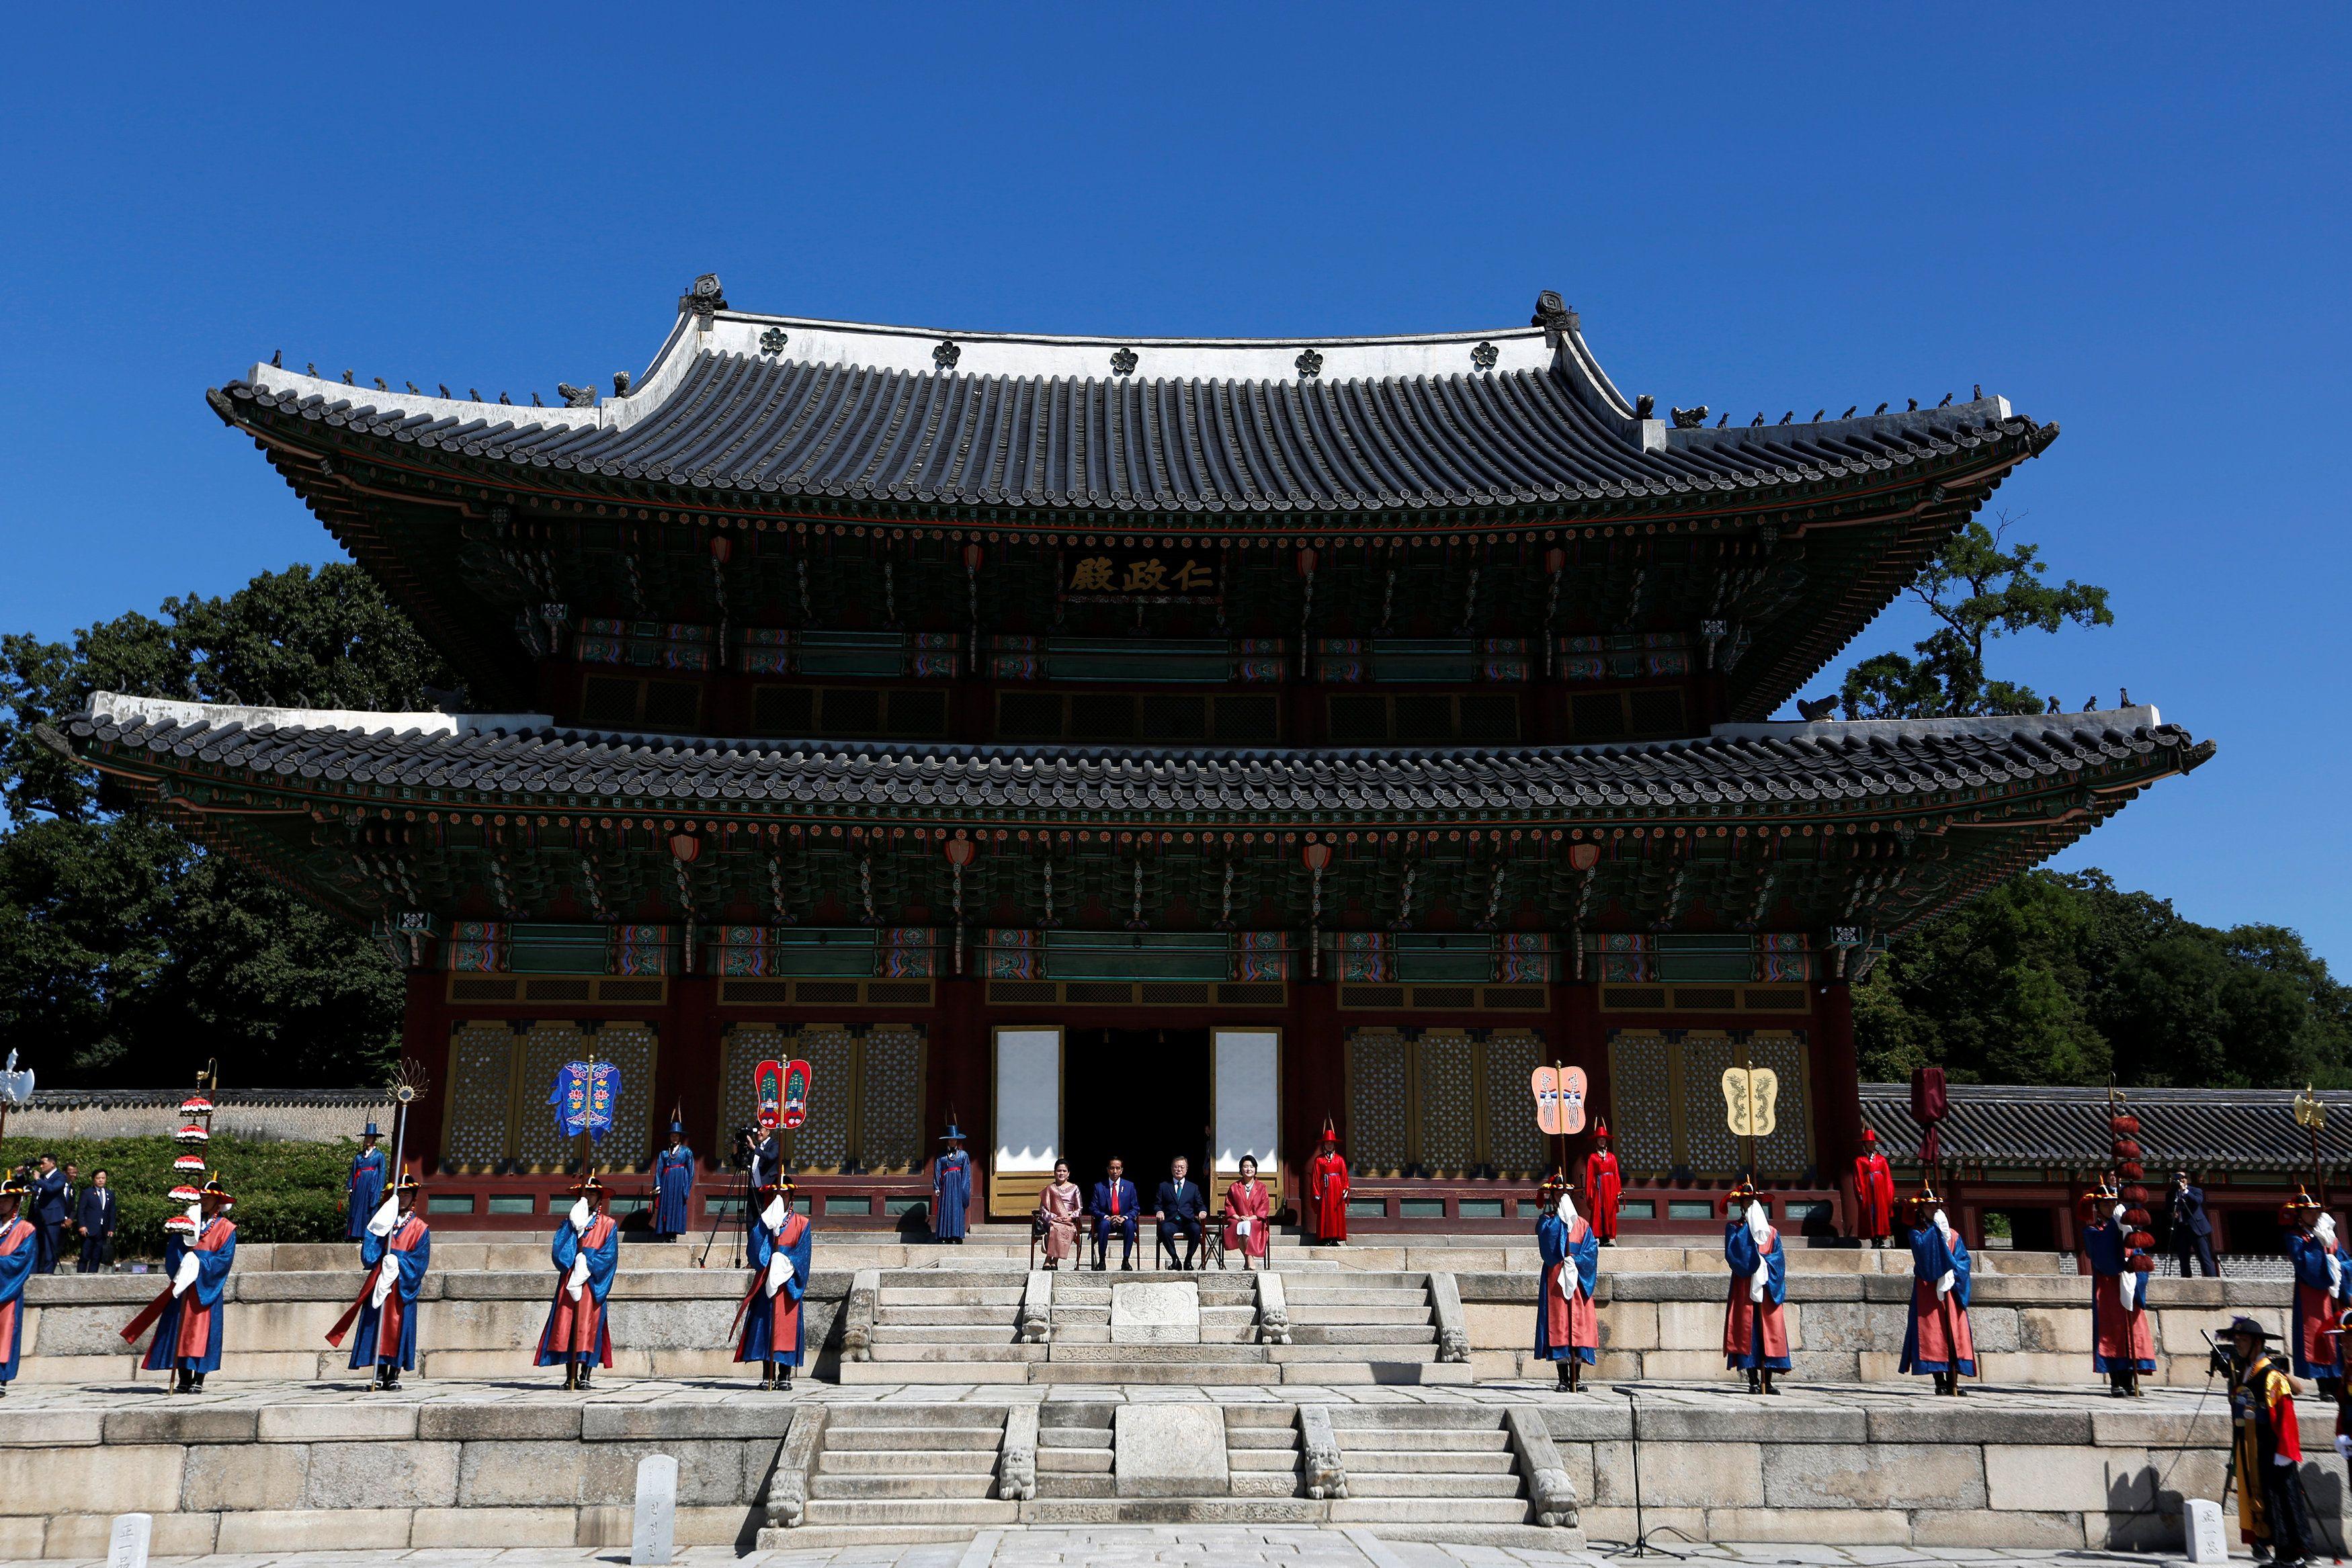 Indahnya istana changdeokgung istana tempat penyambutan jokowi di korea 3bddd9